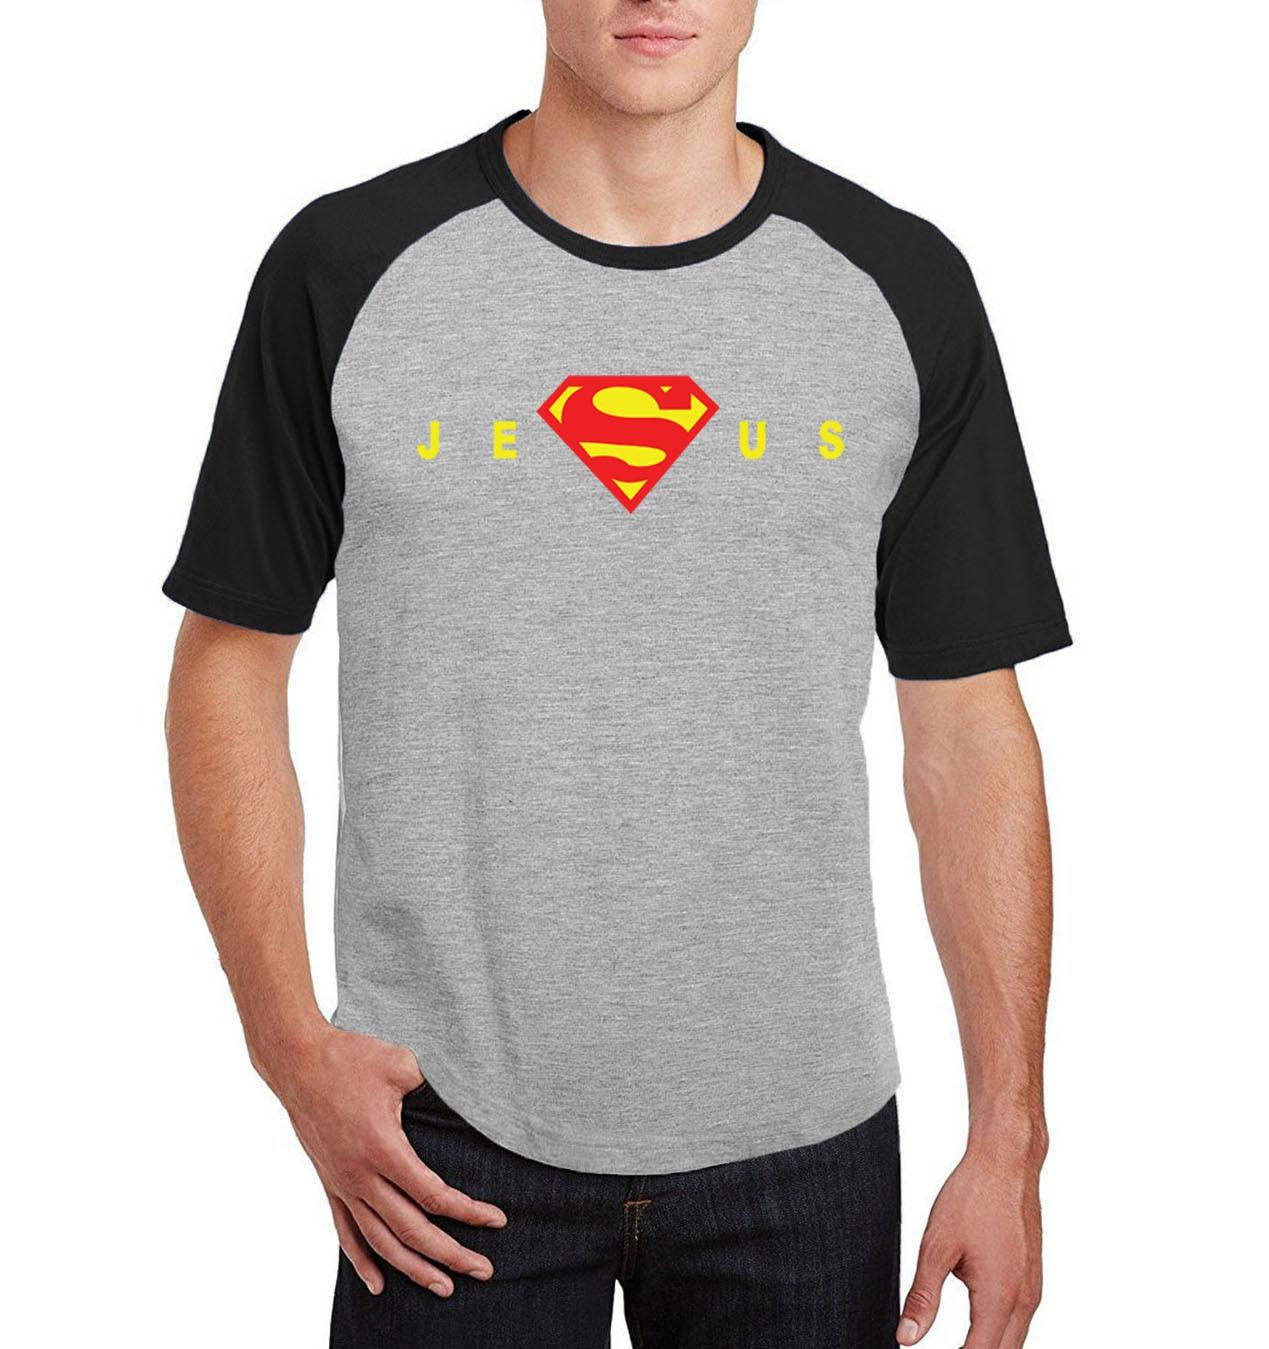 Jesus clothing store